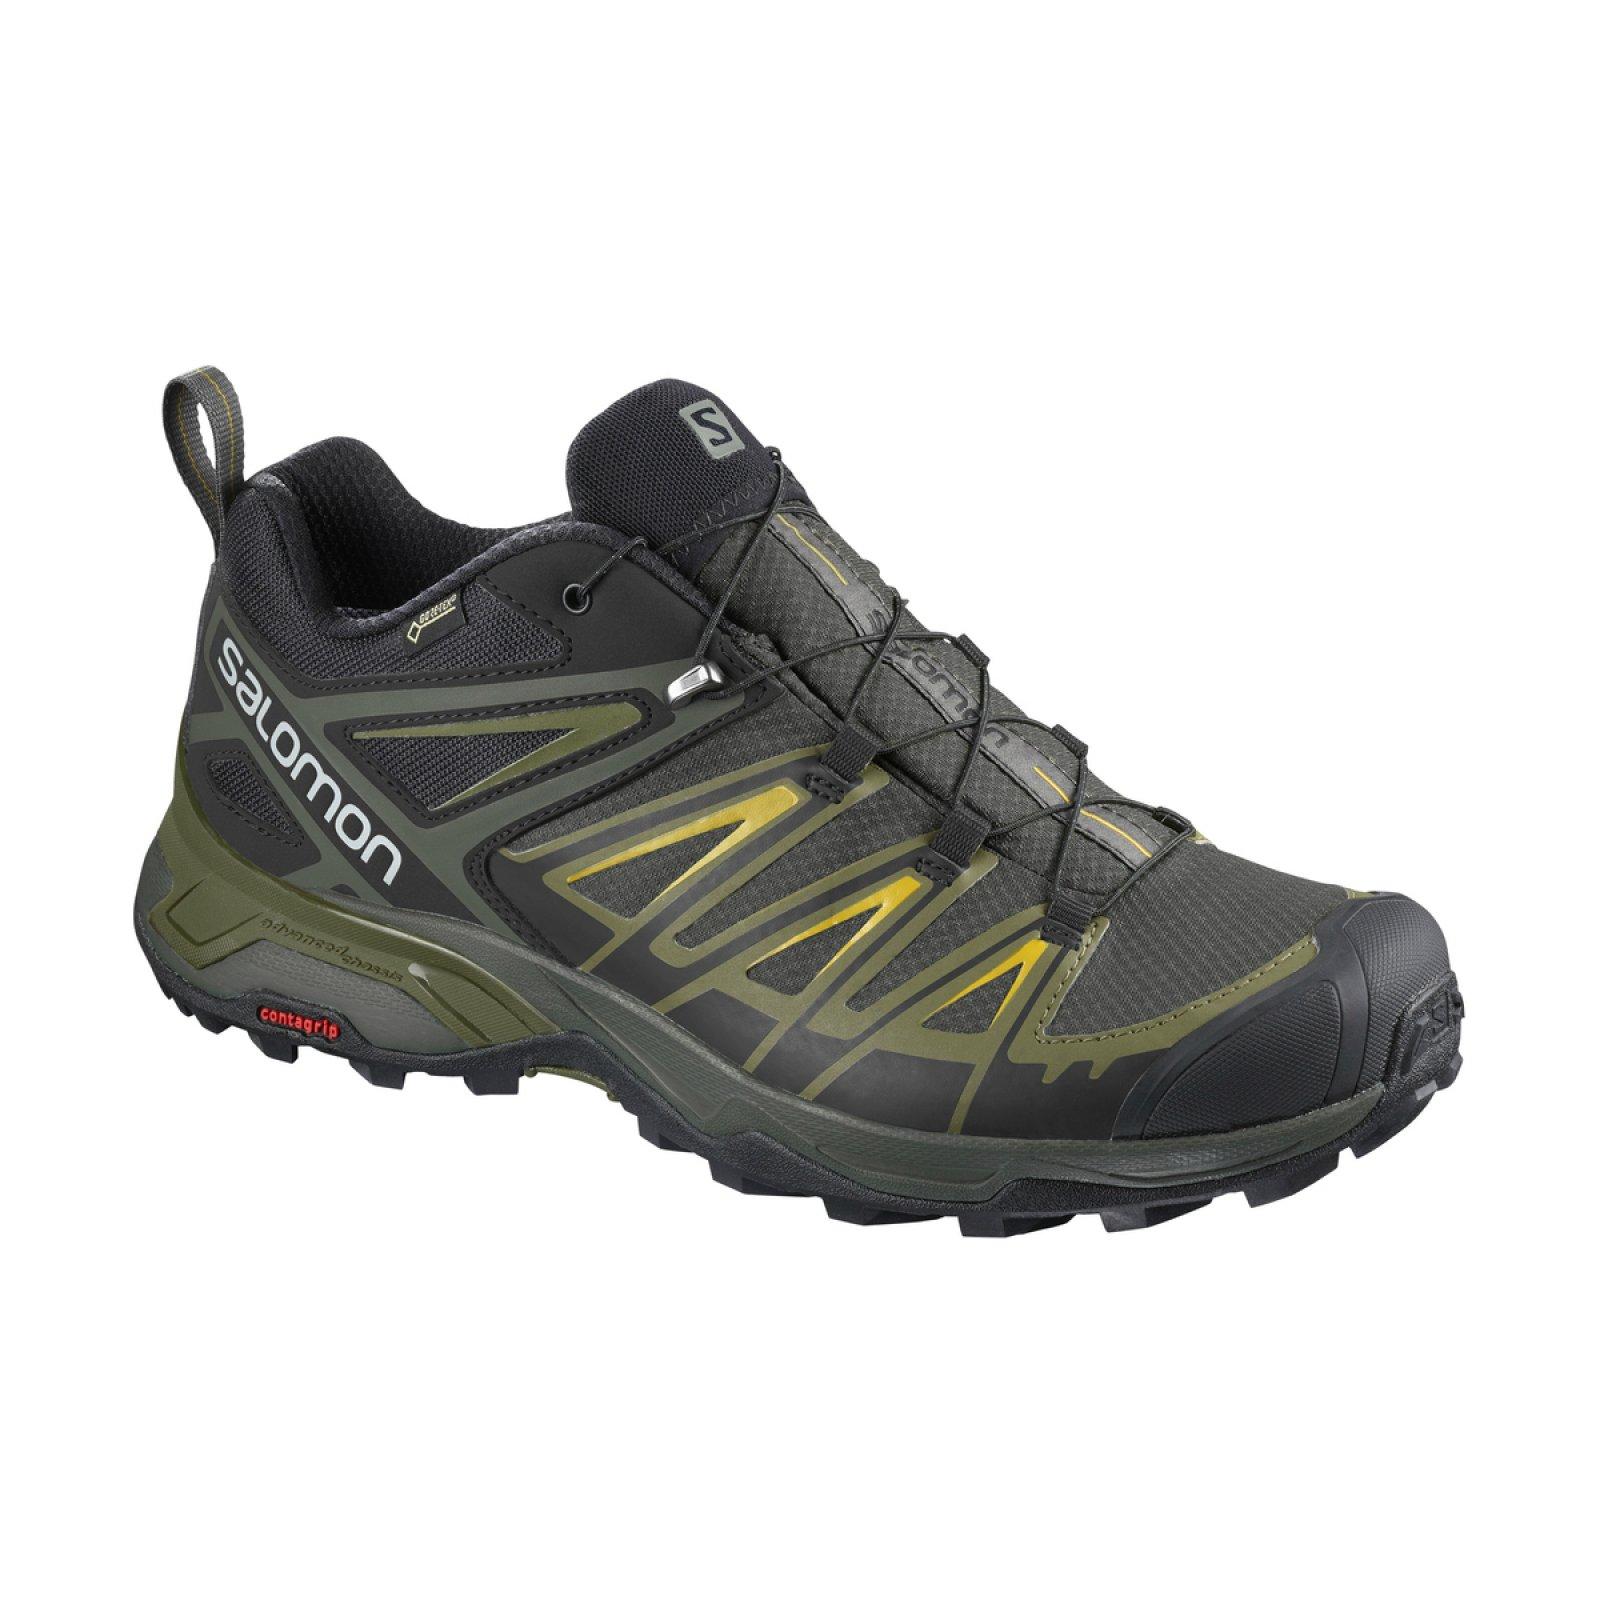 93f5ce2669f Outdoorové boty Salomon X Ultra 3 GTX M L40242200 - Actisport.cz